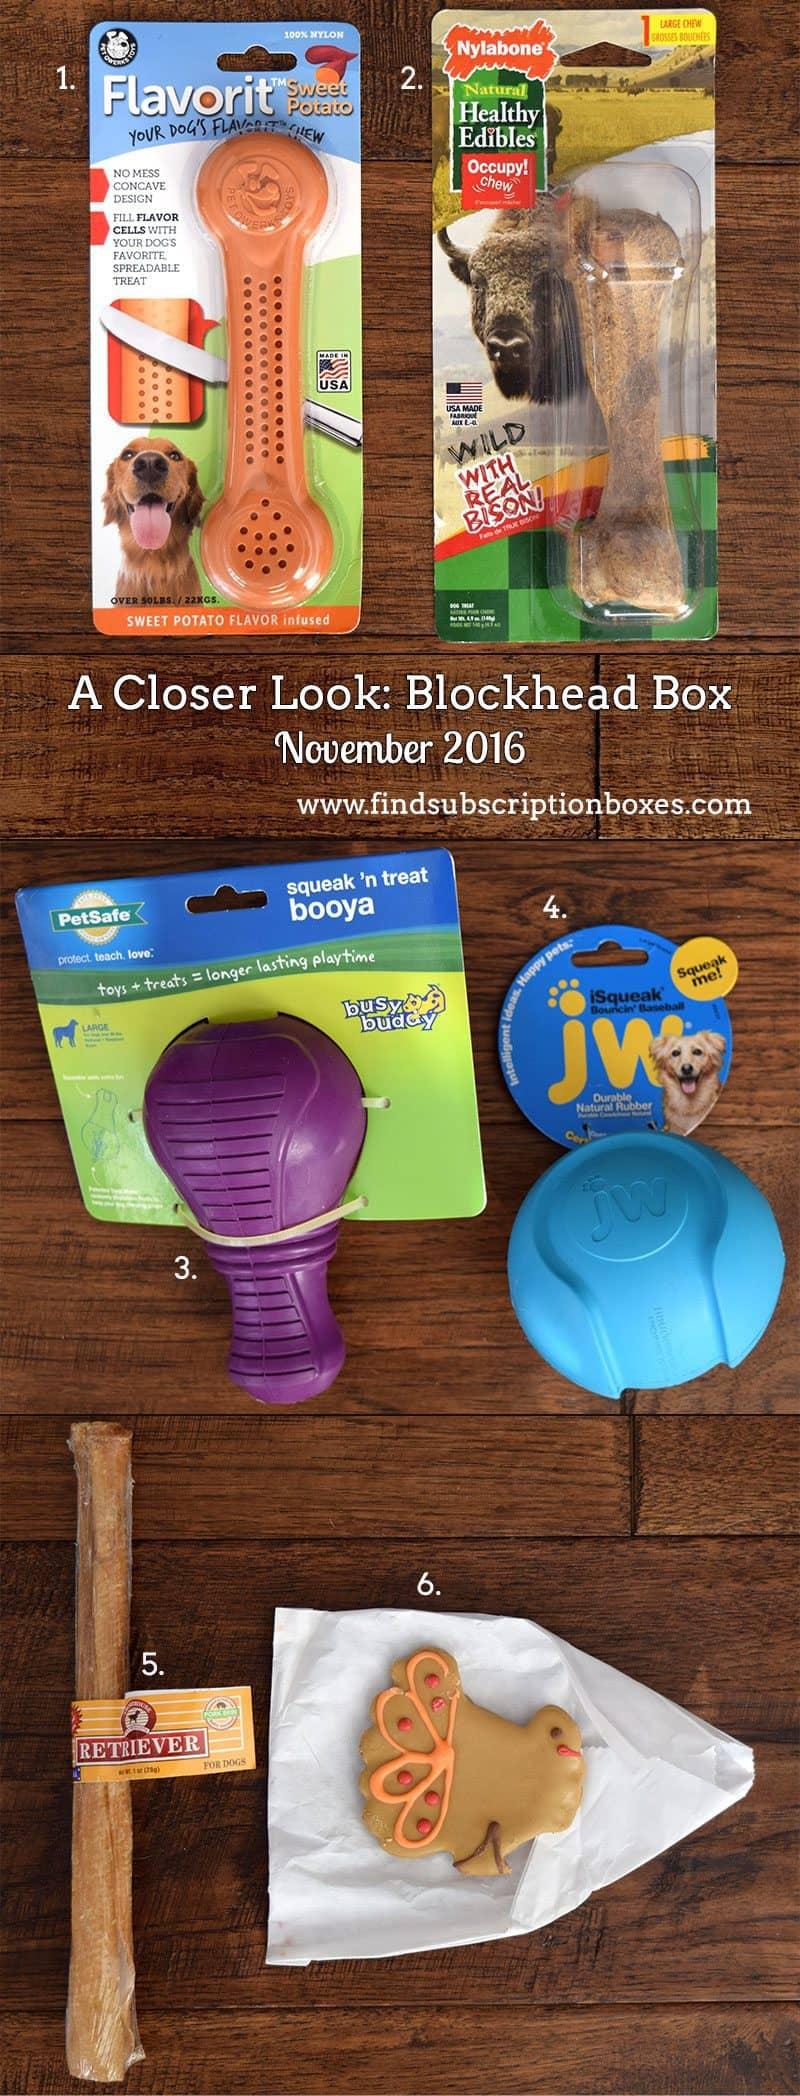 November 2016 Blockhead Box Review - Inside the Box